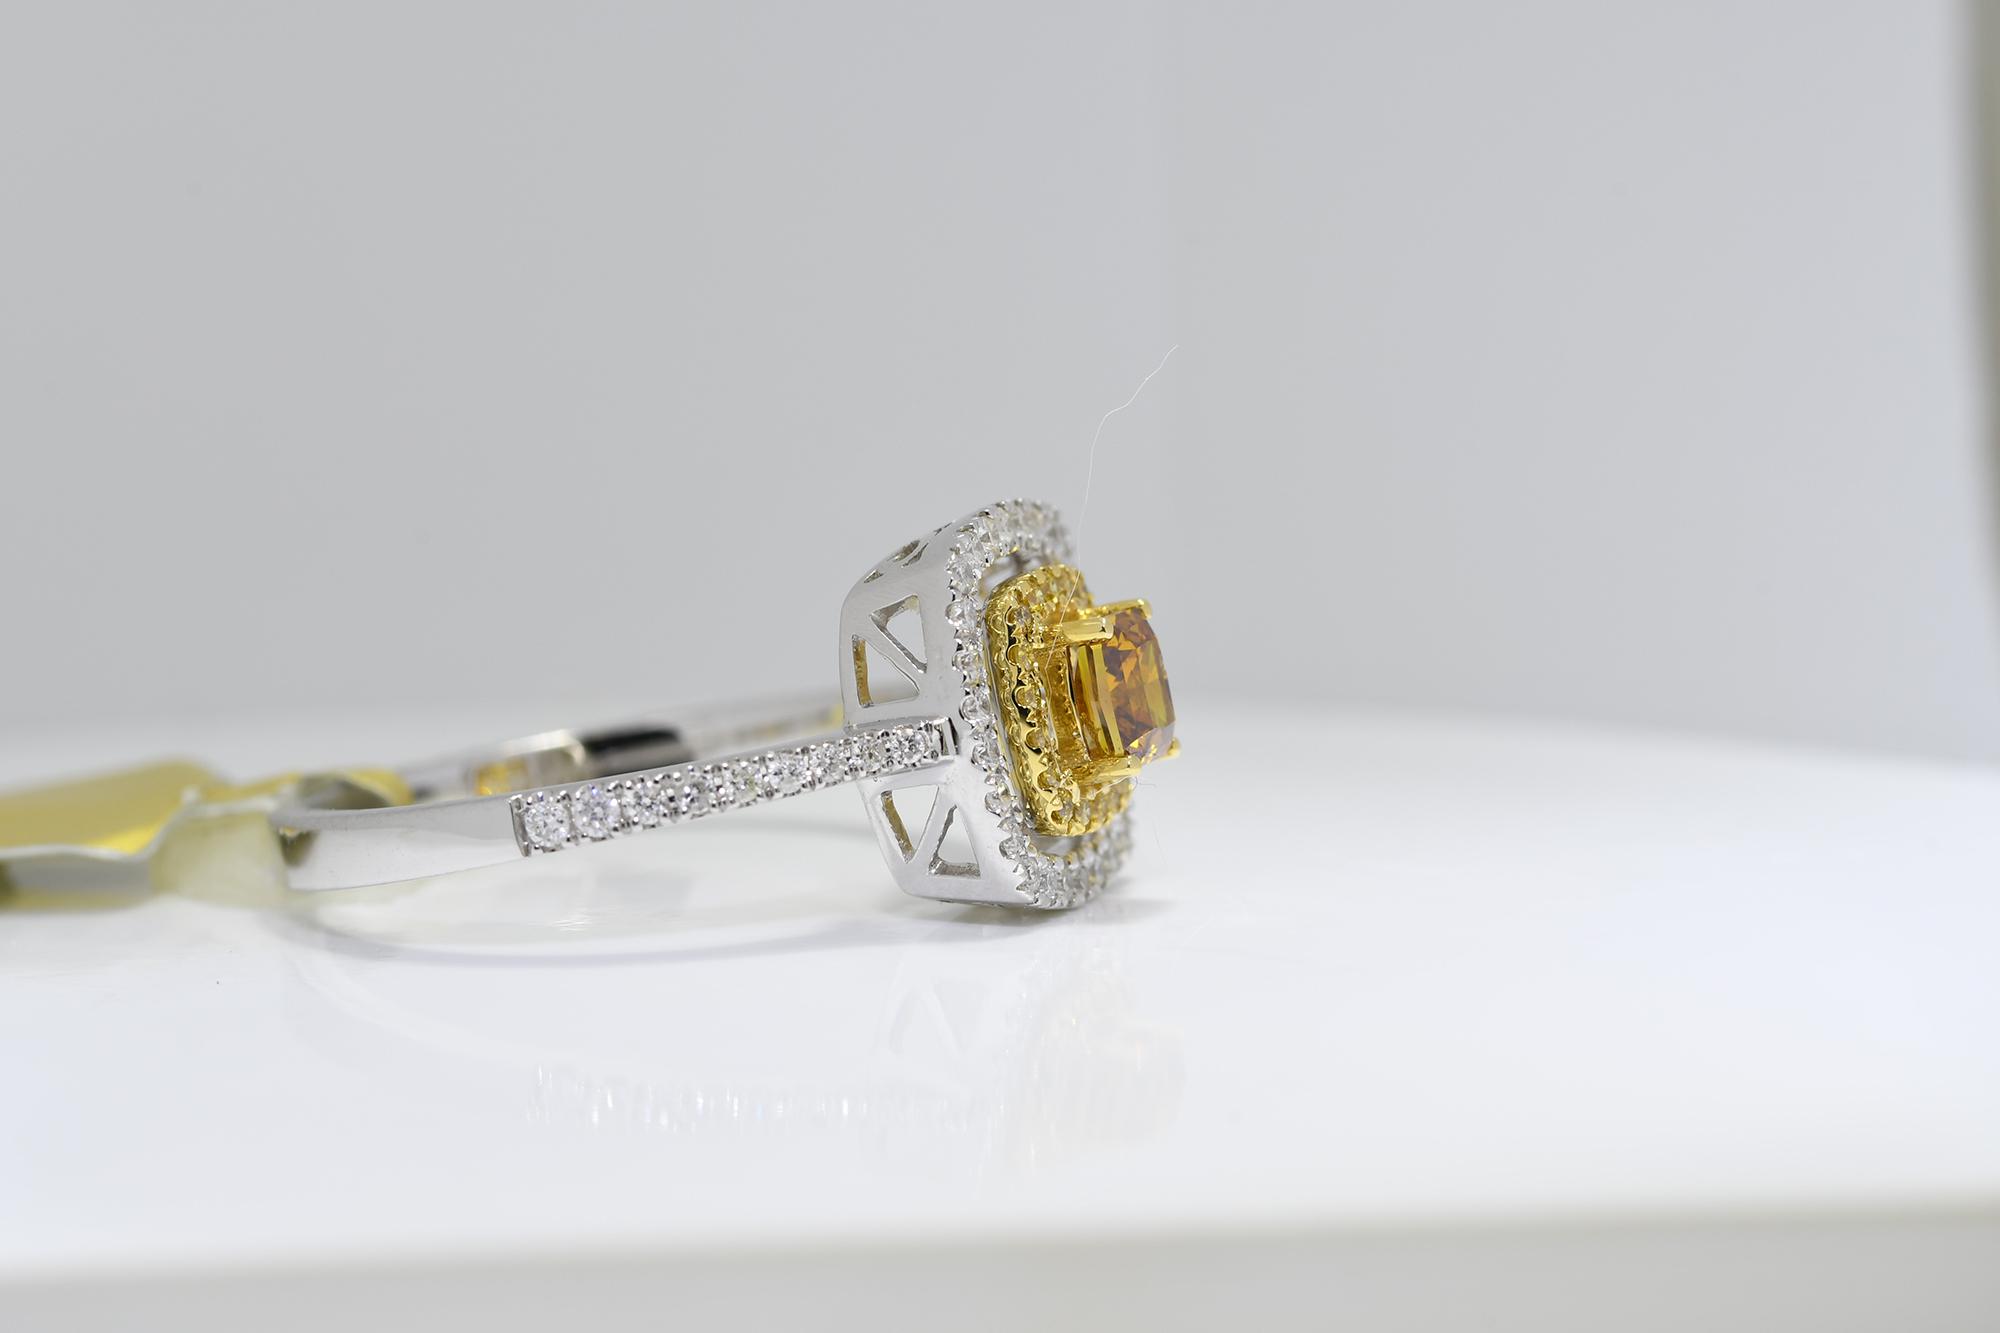 Square Cognac Diamond Ring - Image 2 of 3